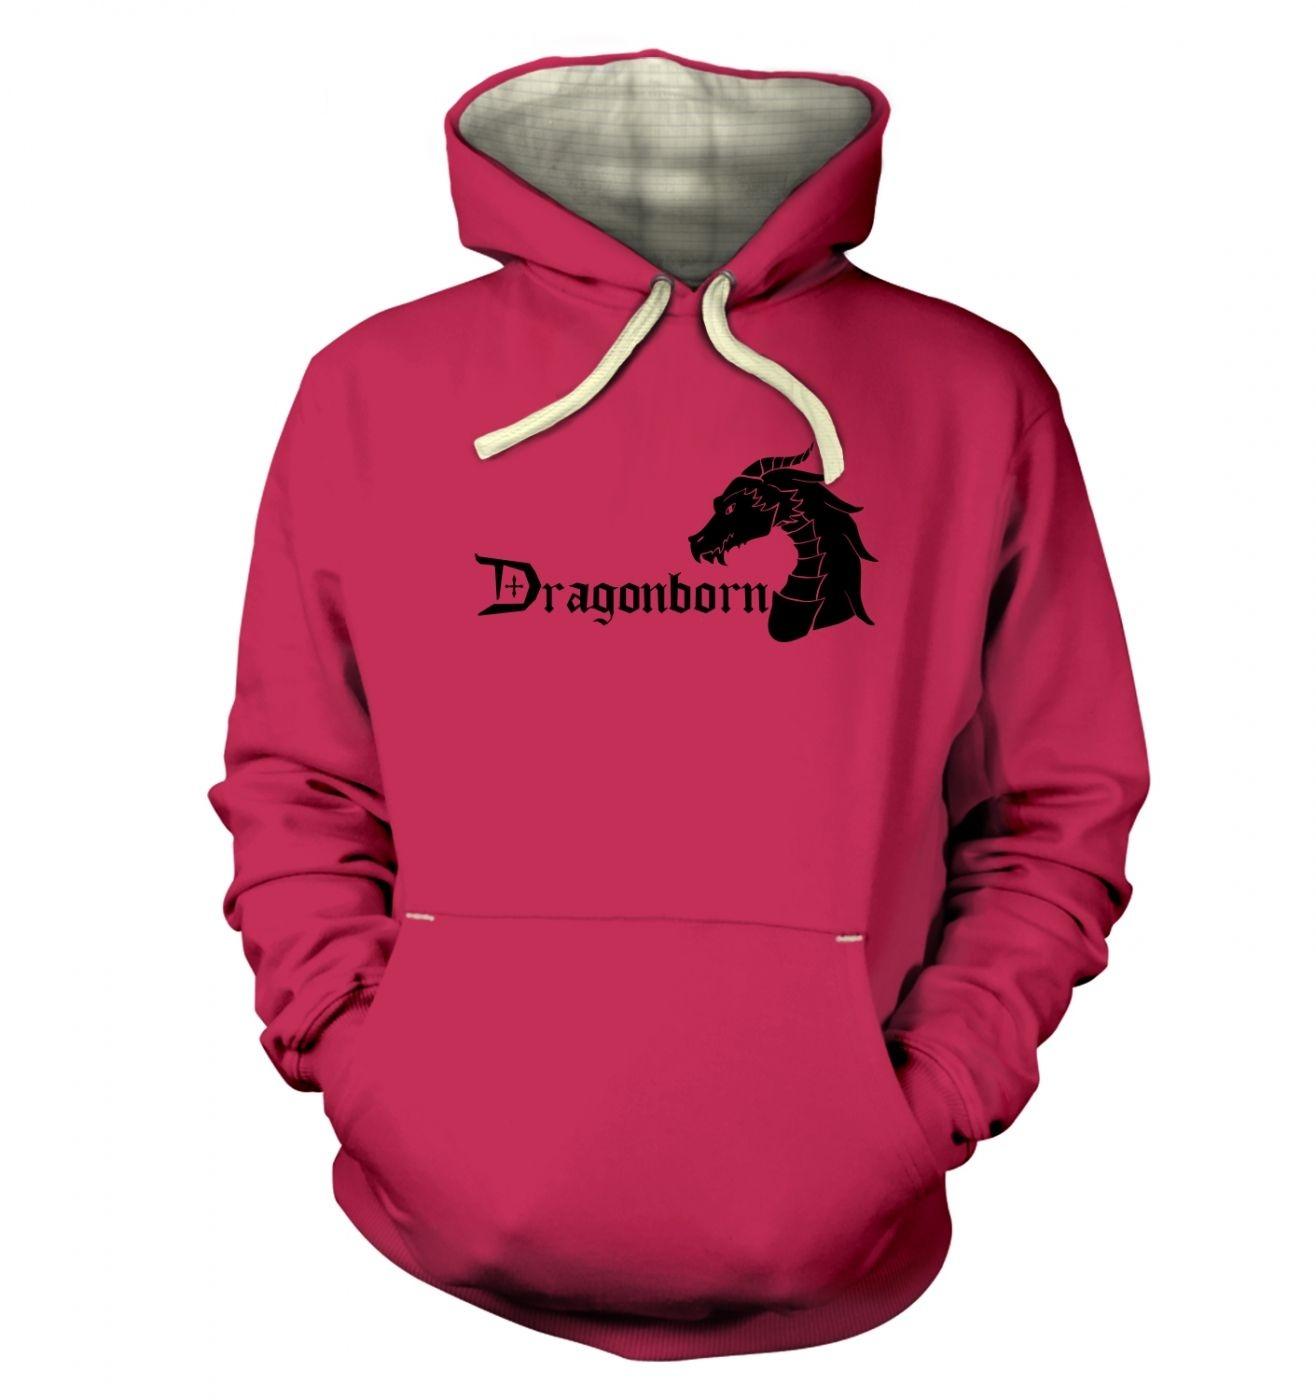 Dragonborn premium hoodie